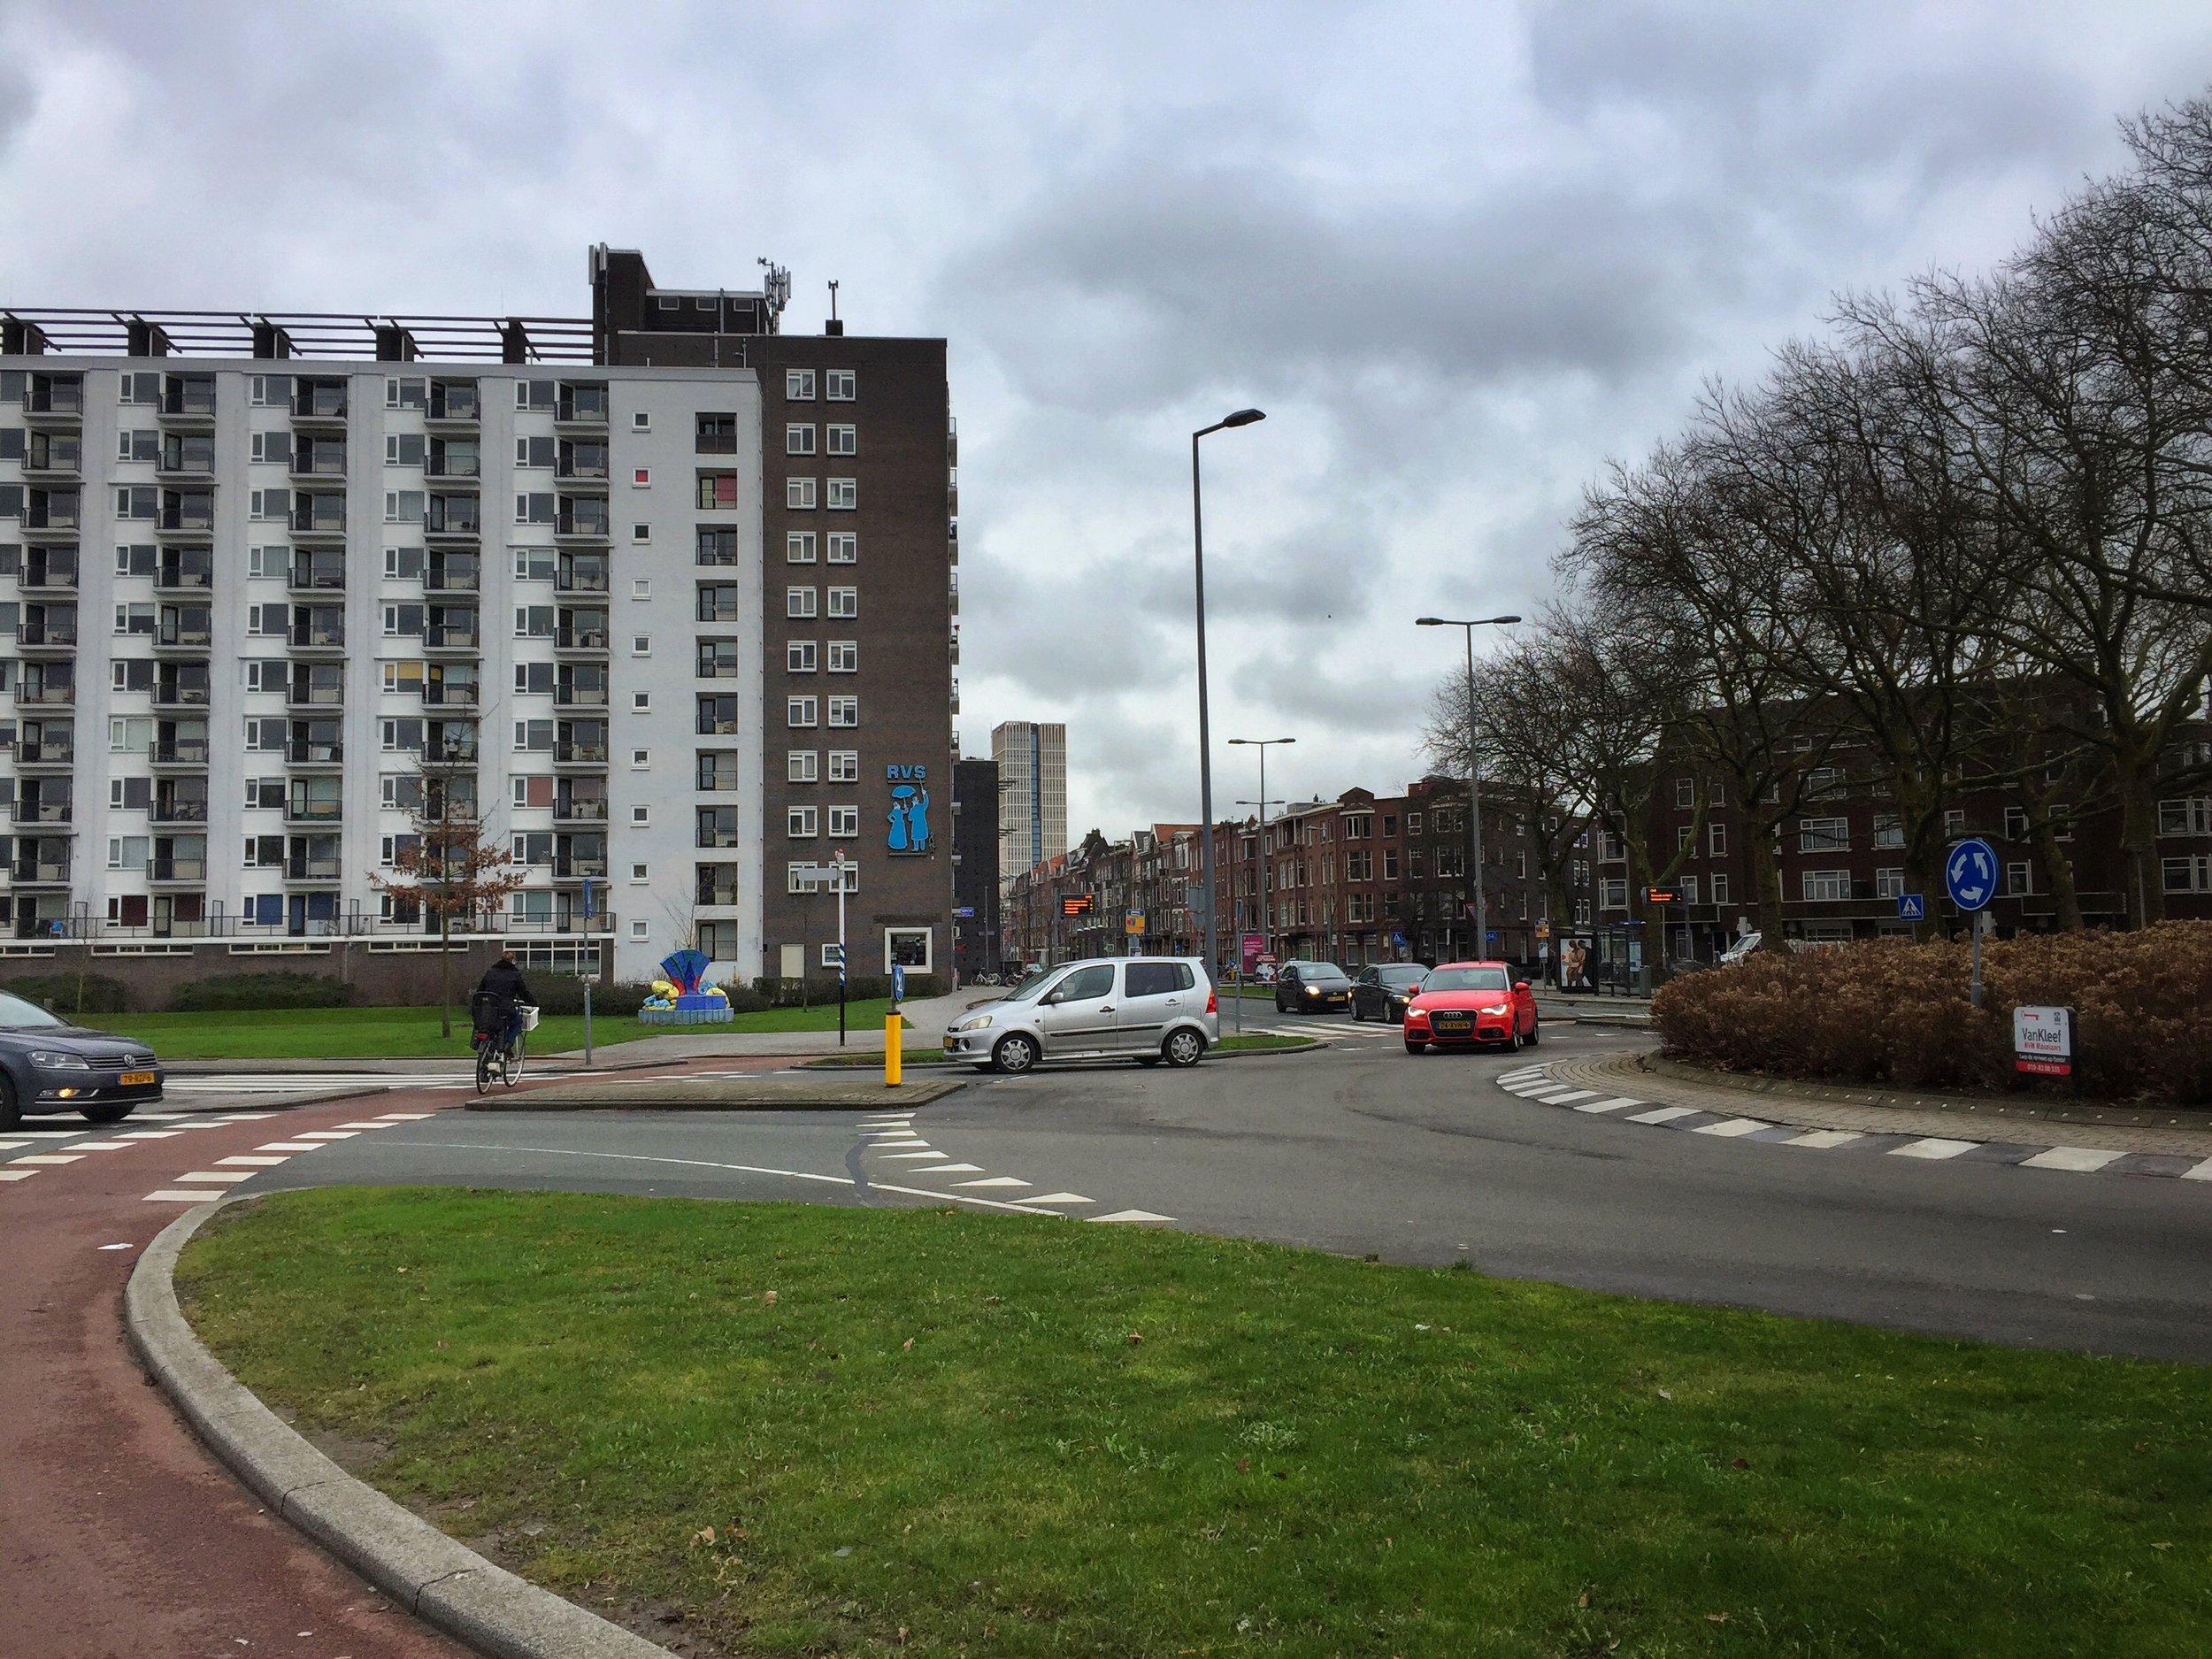 roundabout action shot